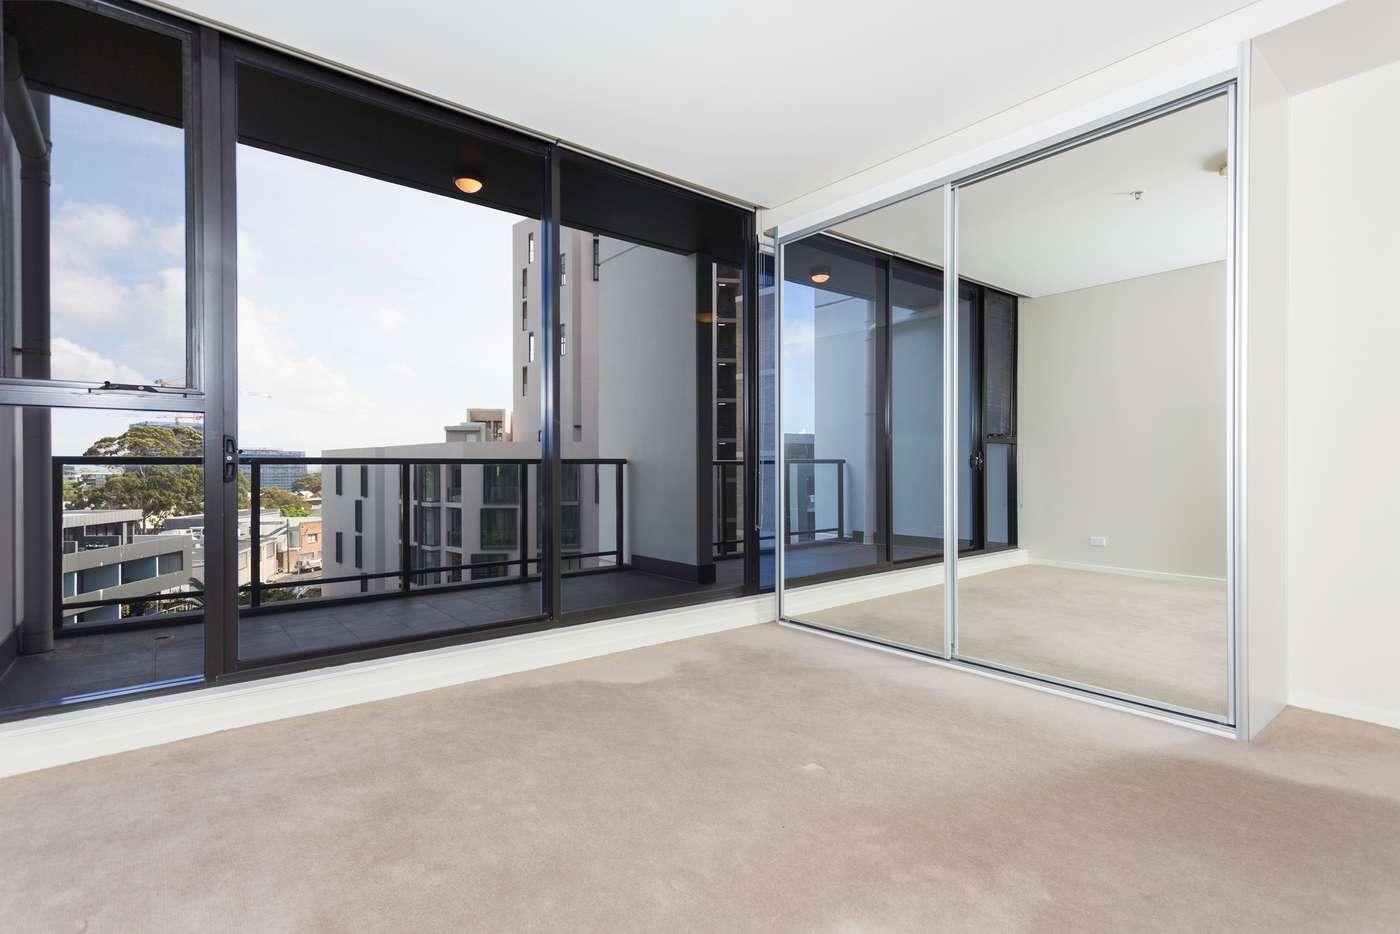 Main view of Homely apartment listing, C708/15 Joynton Avenue, Zetland NSW 2017